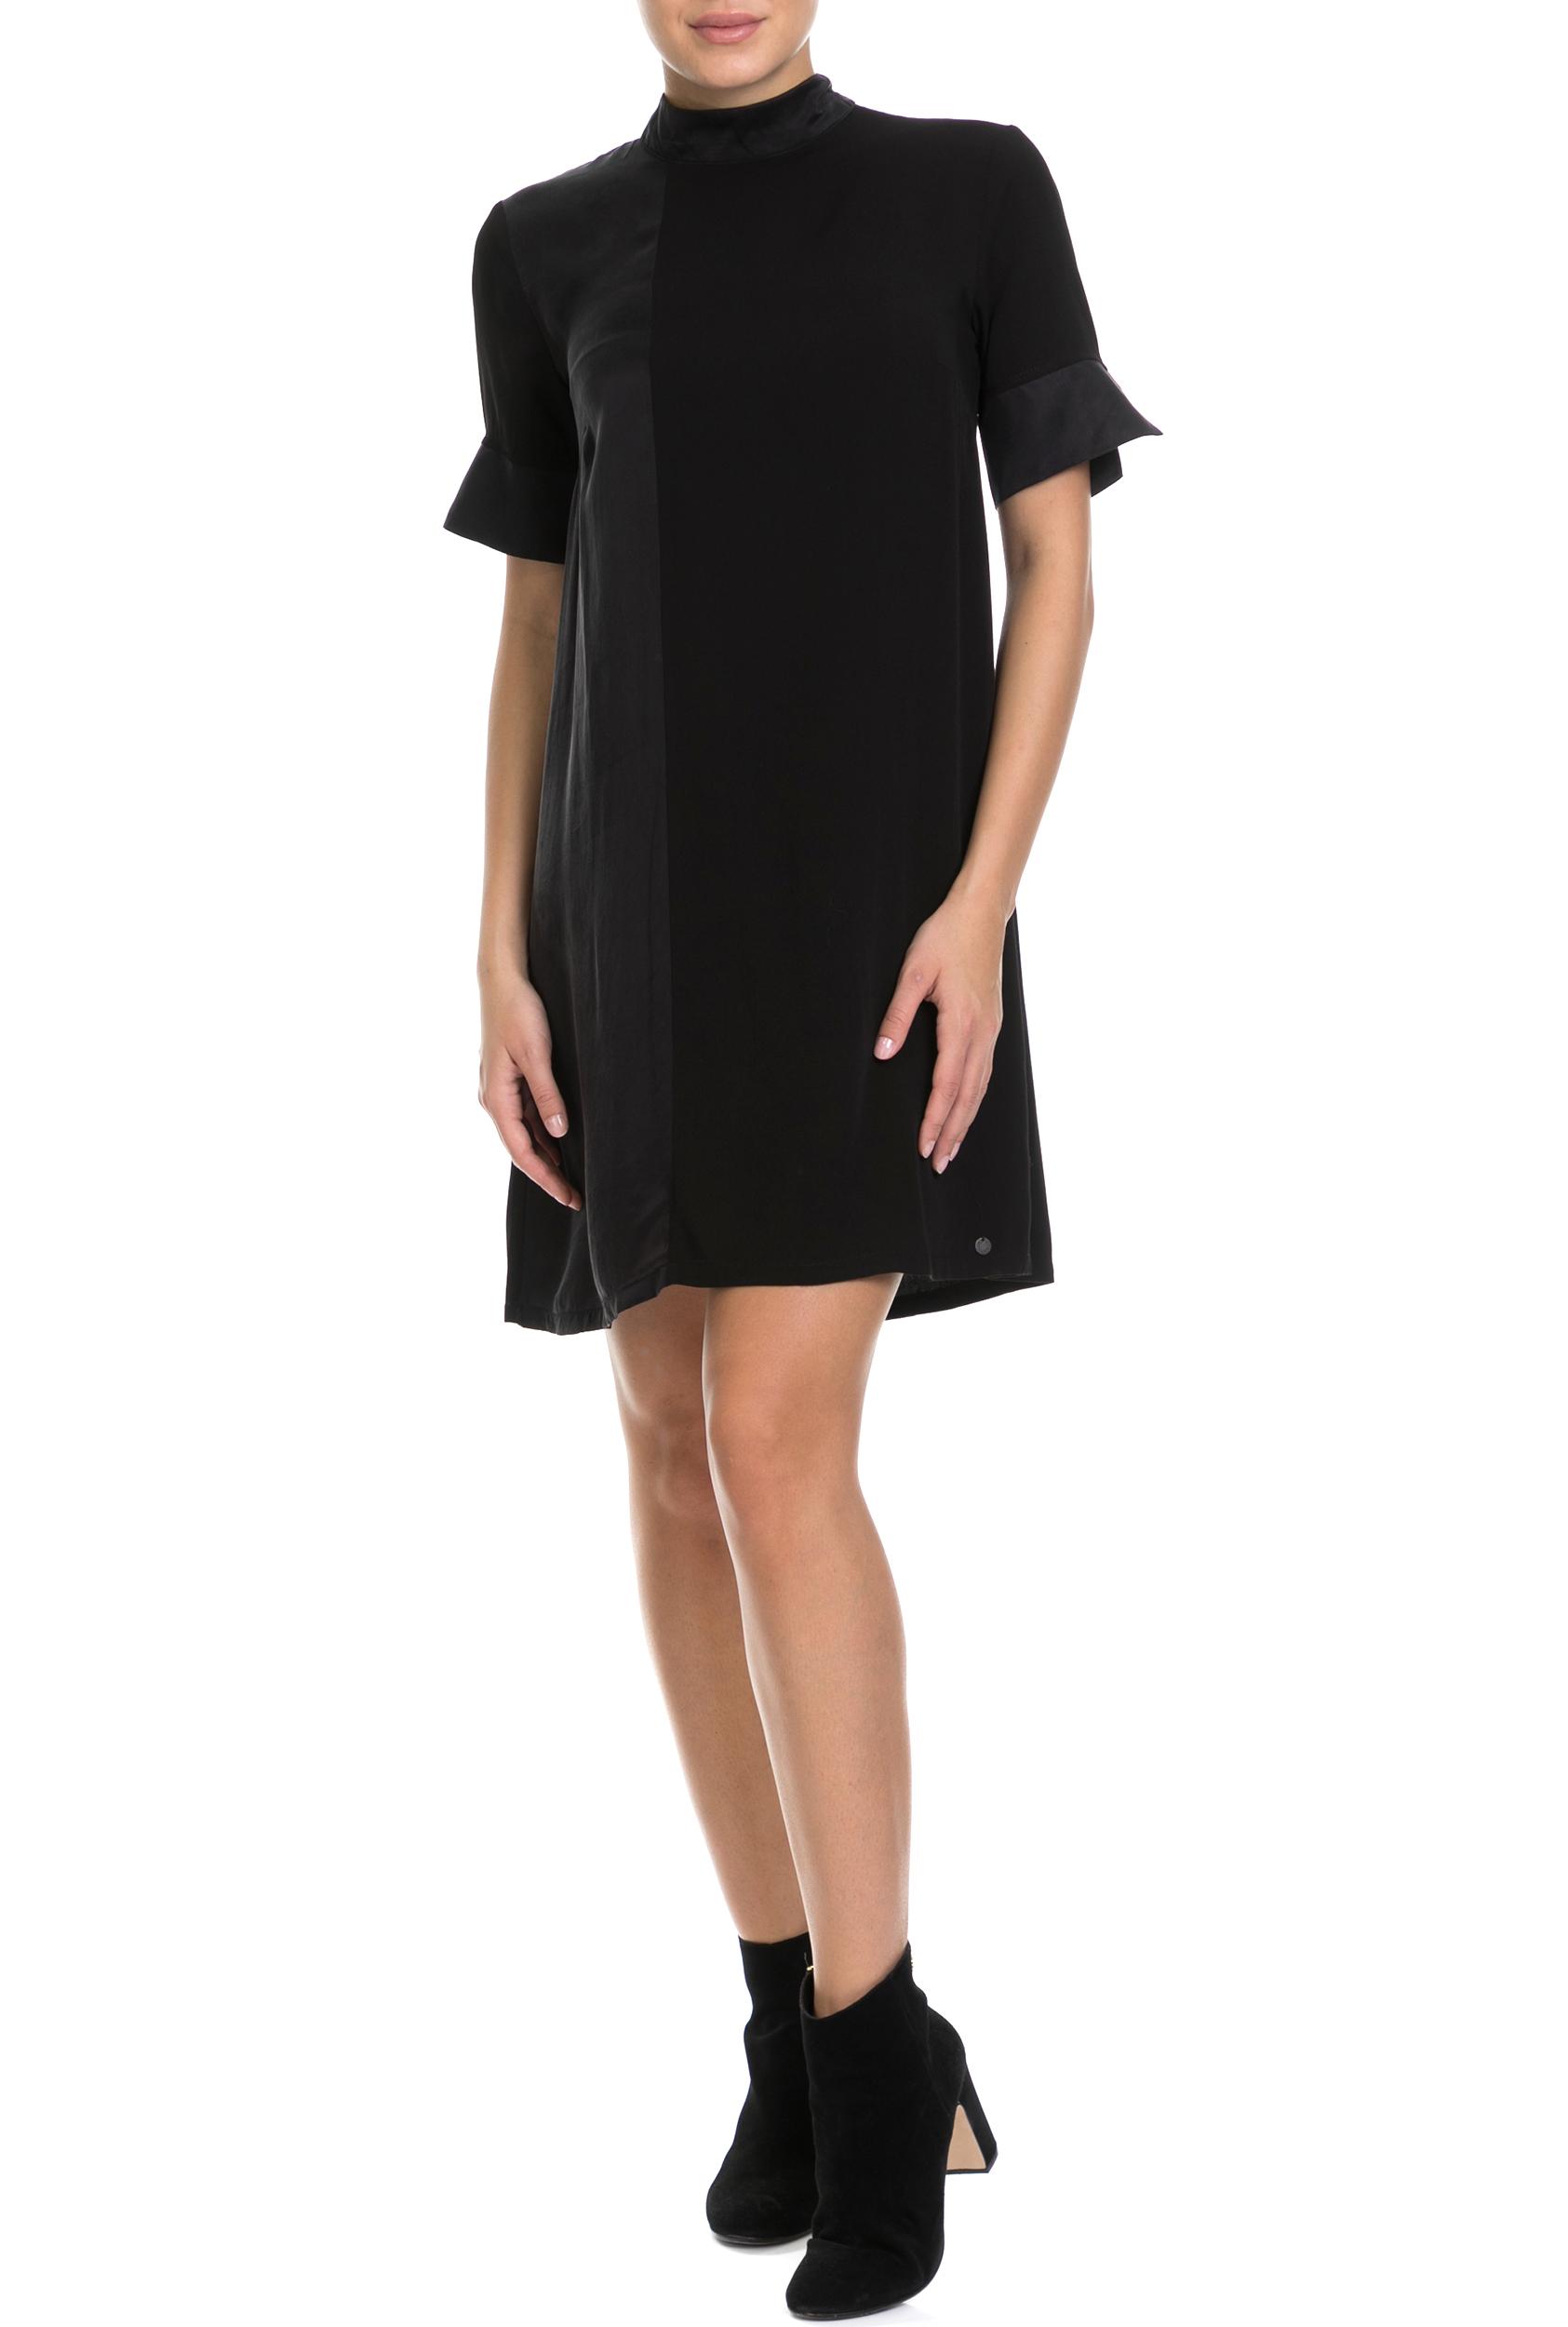 NUMPH - Γυναικείο φόρεμα NUMPH μαύρο γυναικεία ρούχα φόρεματα μίνι